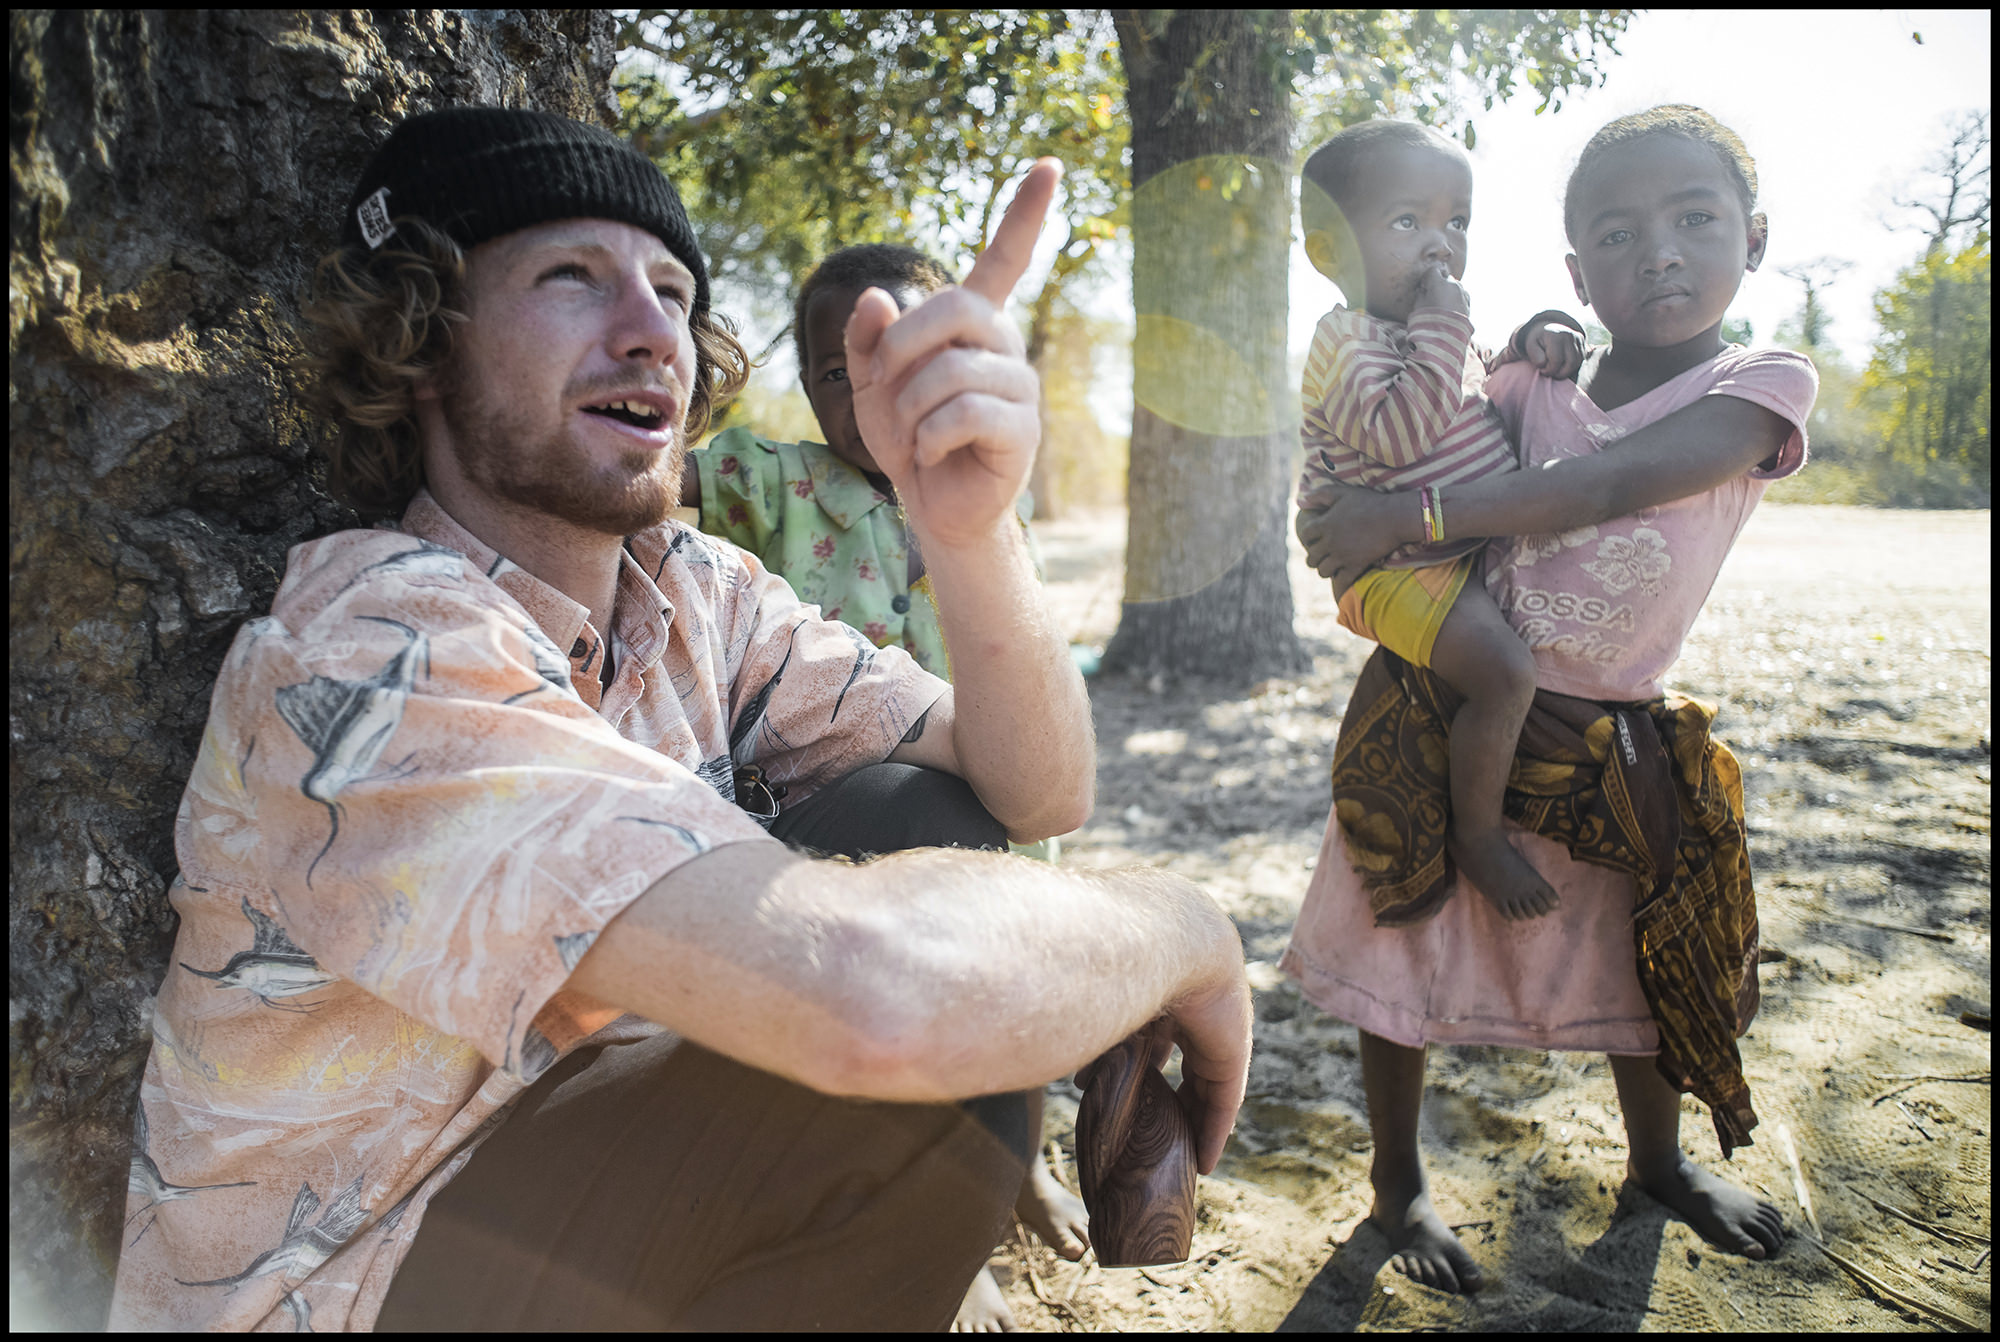 Digital Patrik Wallner Baobab Barney with Kids LOWQ 2000P